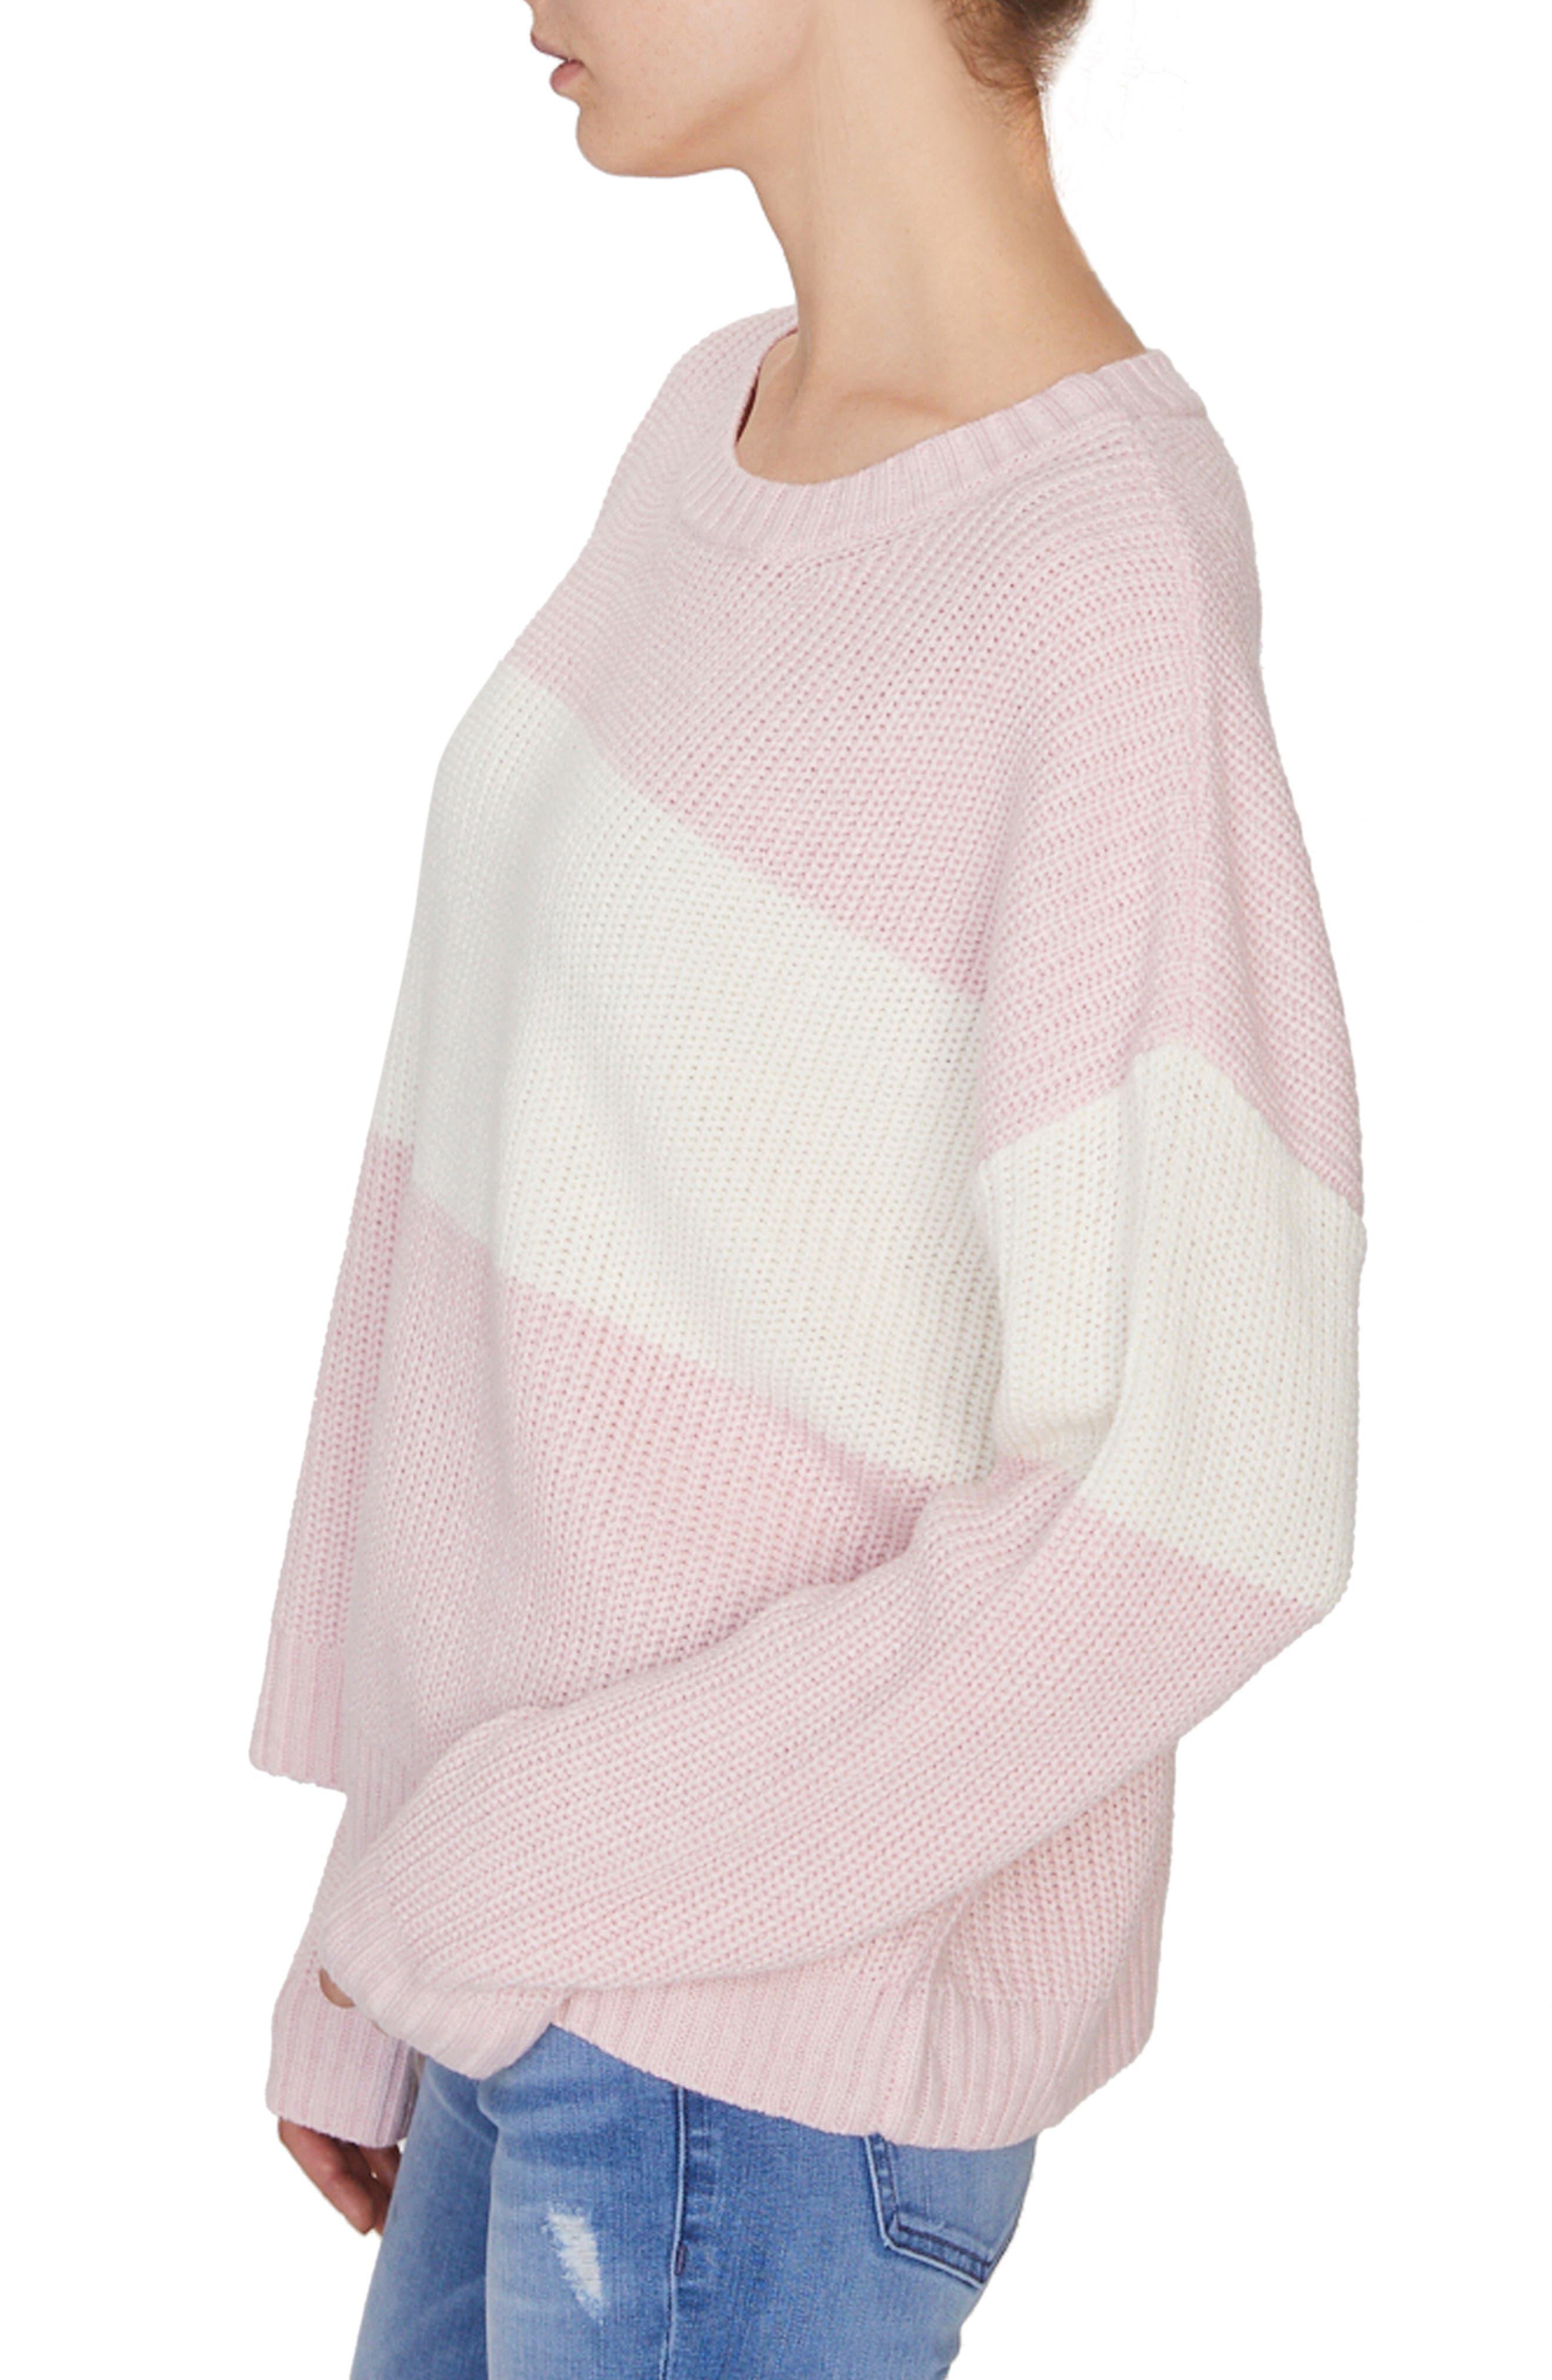 SANCTUARY,                             Billie Colorblock Shaker Sweater,                             Alternate thumbnail 3, color,                             HEATHER CHERRYBLOSSOM/ NATURAL